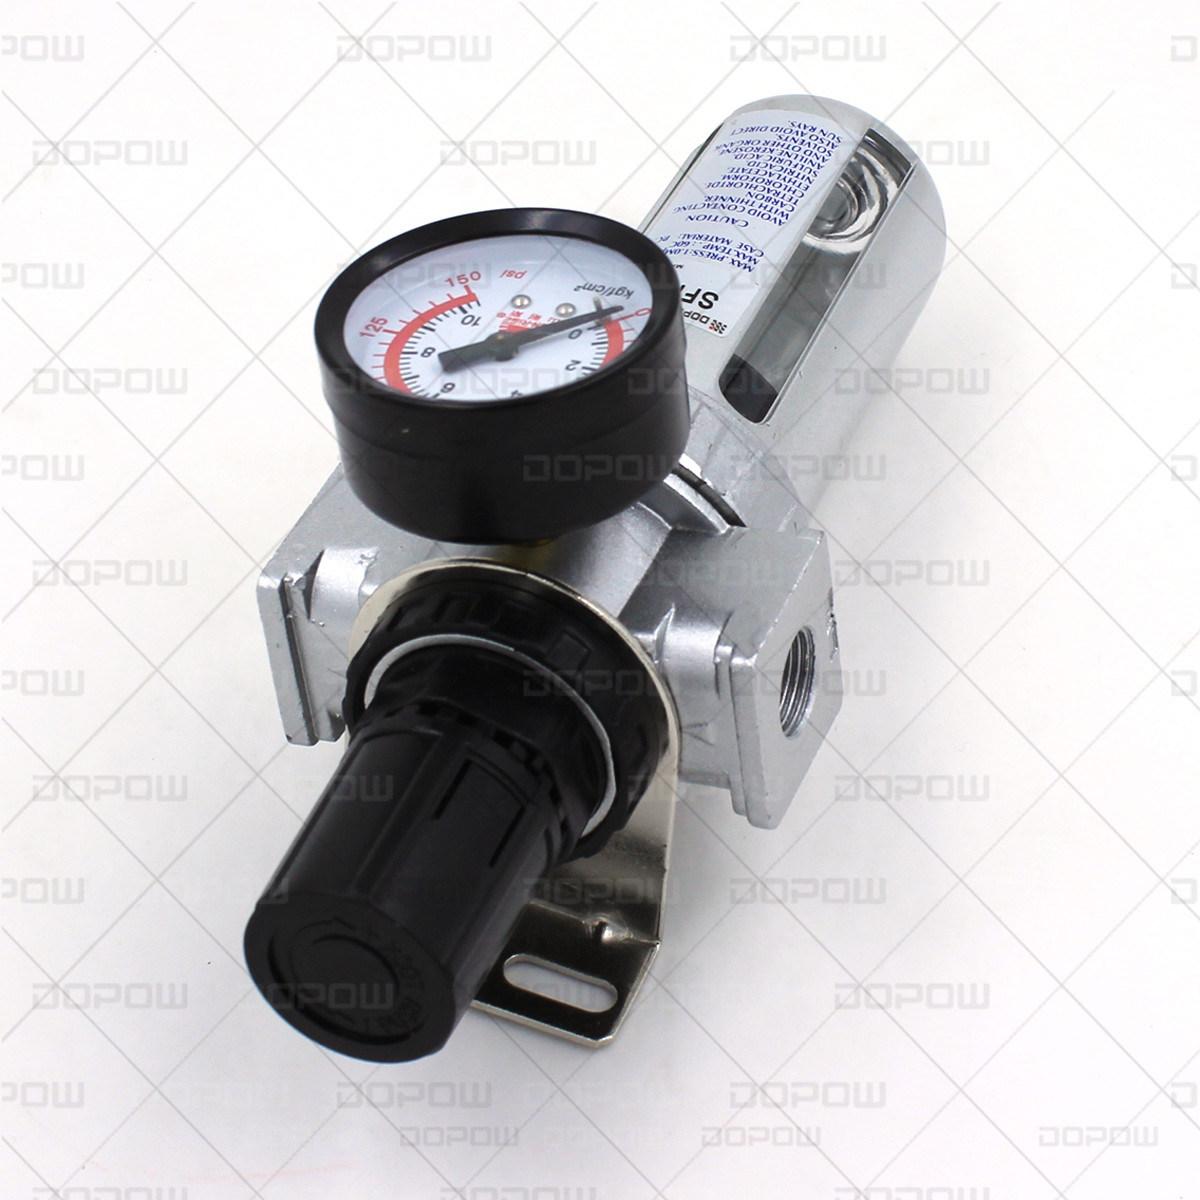 Dopow Sfr 300 Filter Regulator Pneumatic